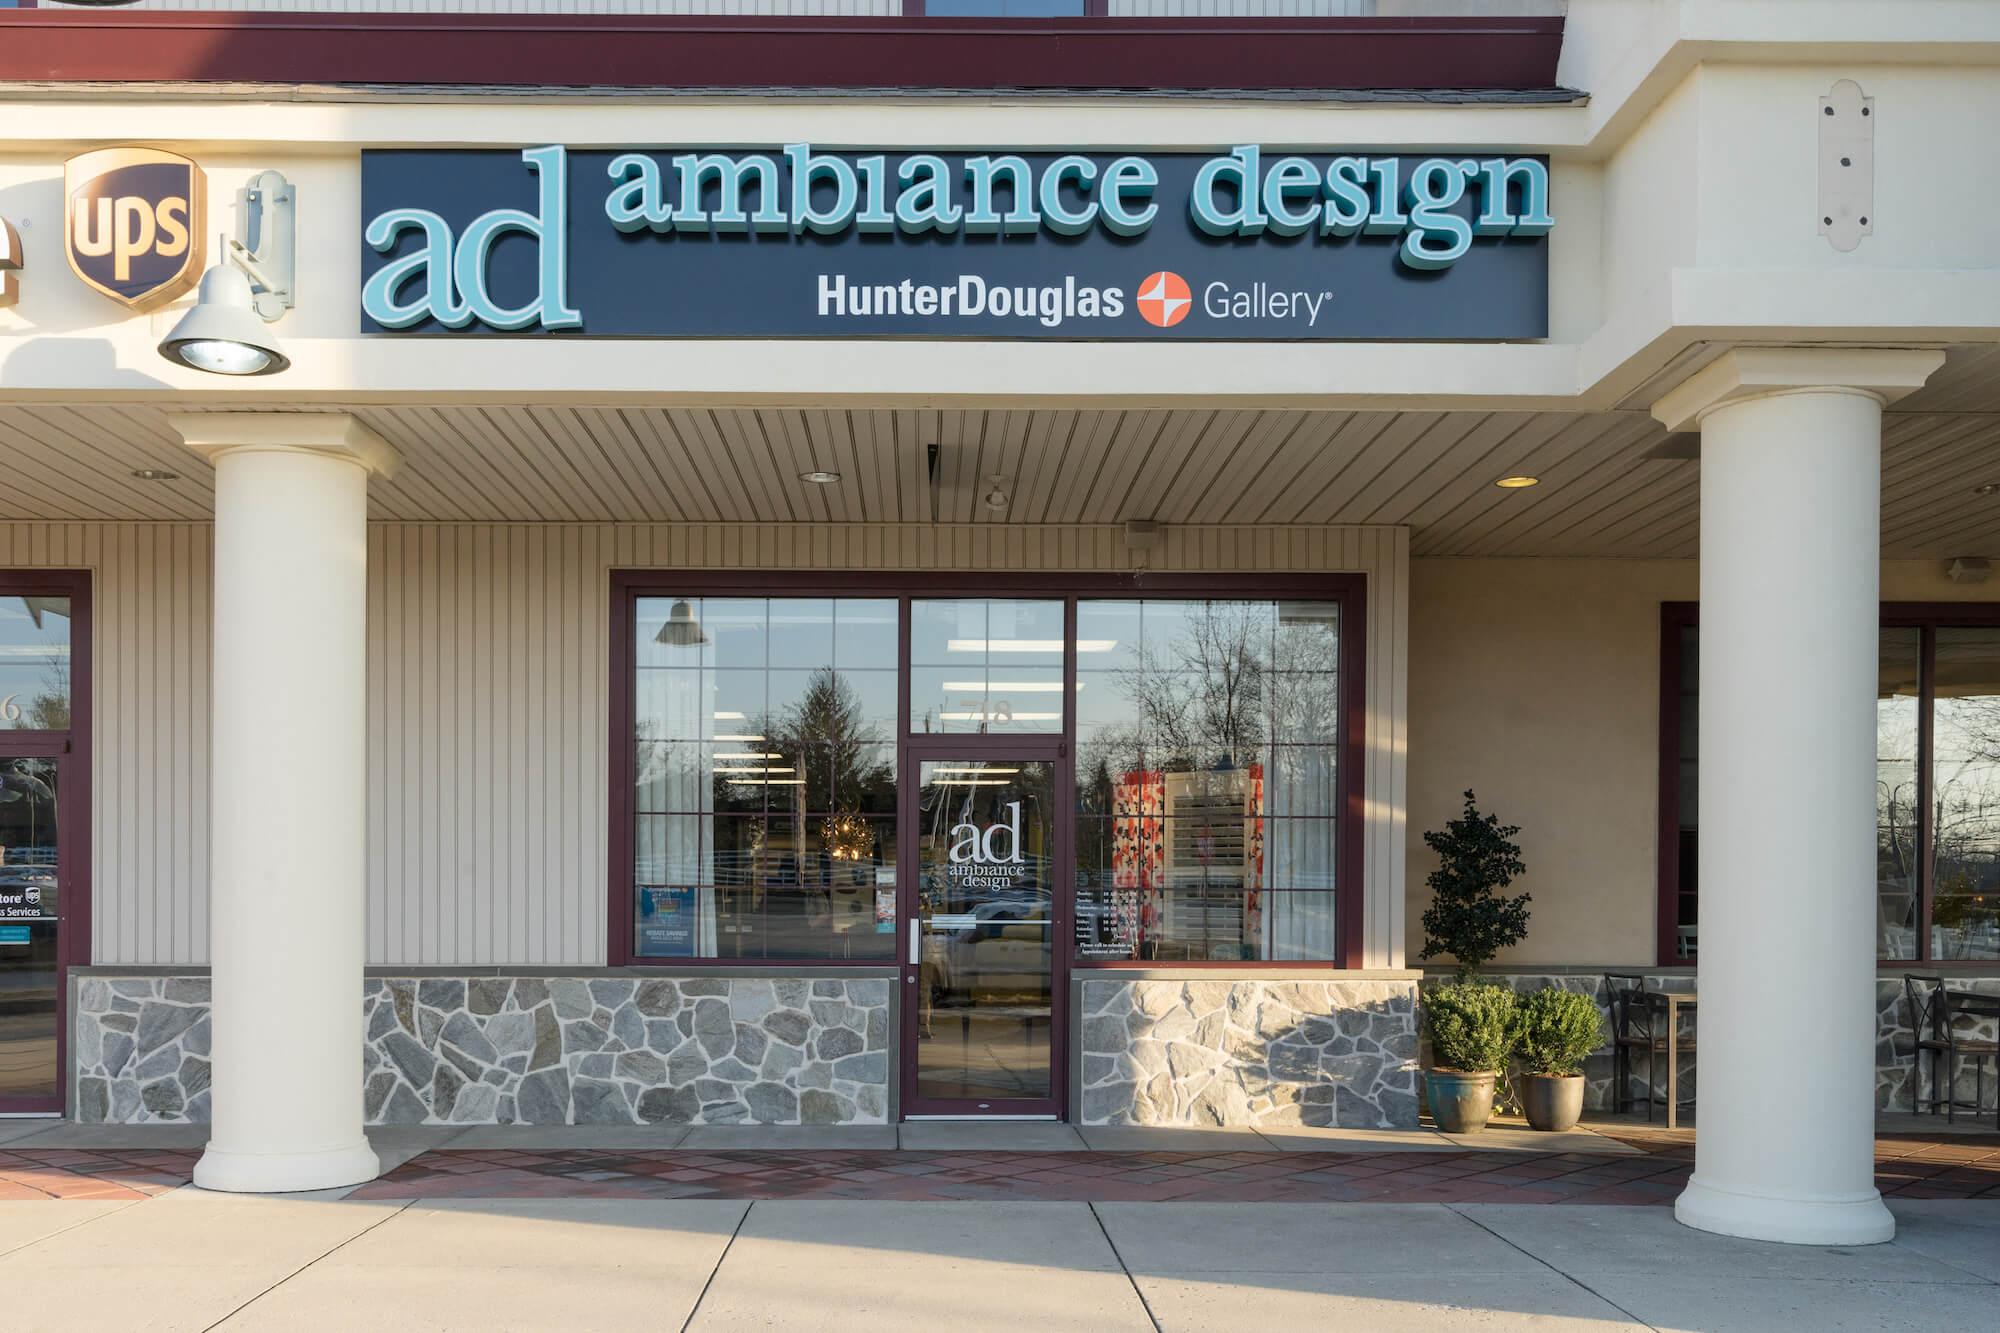 Ambiance Design Hunter Douglas Gallery Showroom building